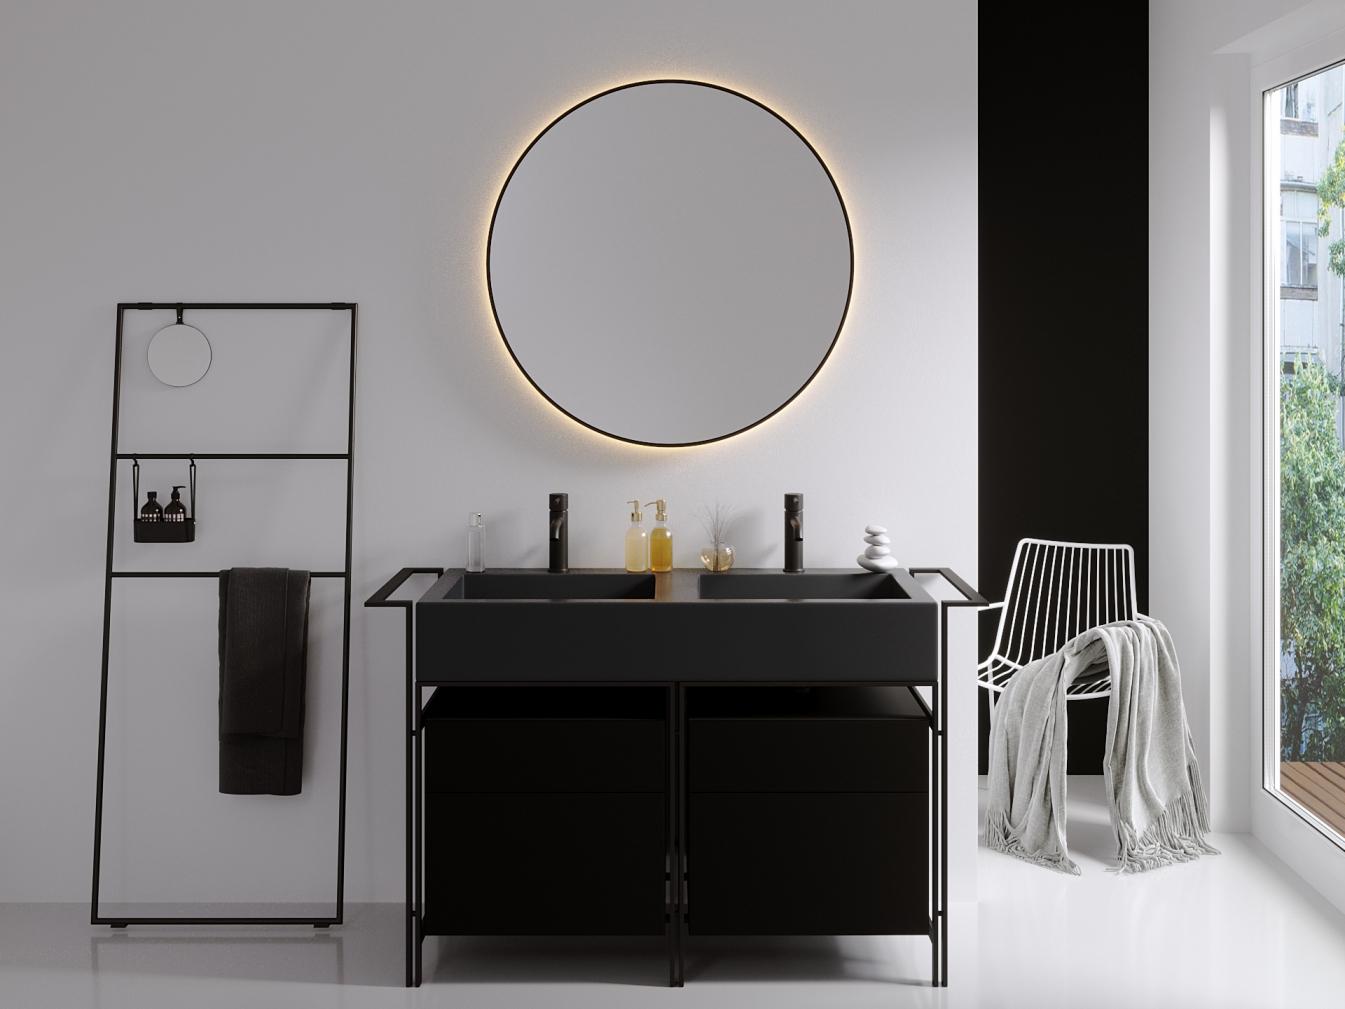 Kreisrunder Spiegel mit Aluminiumrahmen mit LED